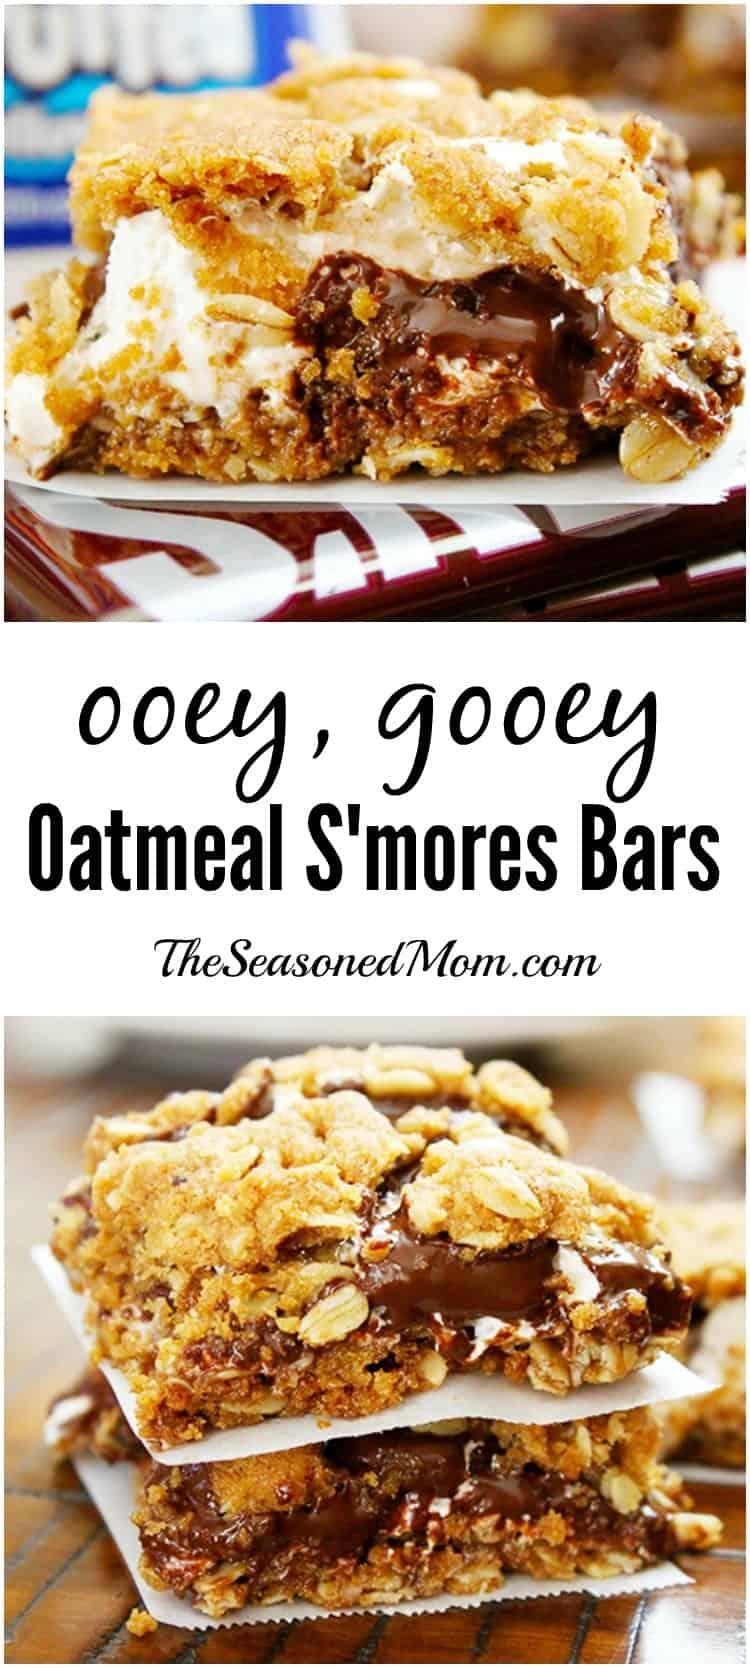 Ooey Gooey Oatmeal Smores Bars